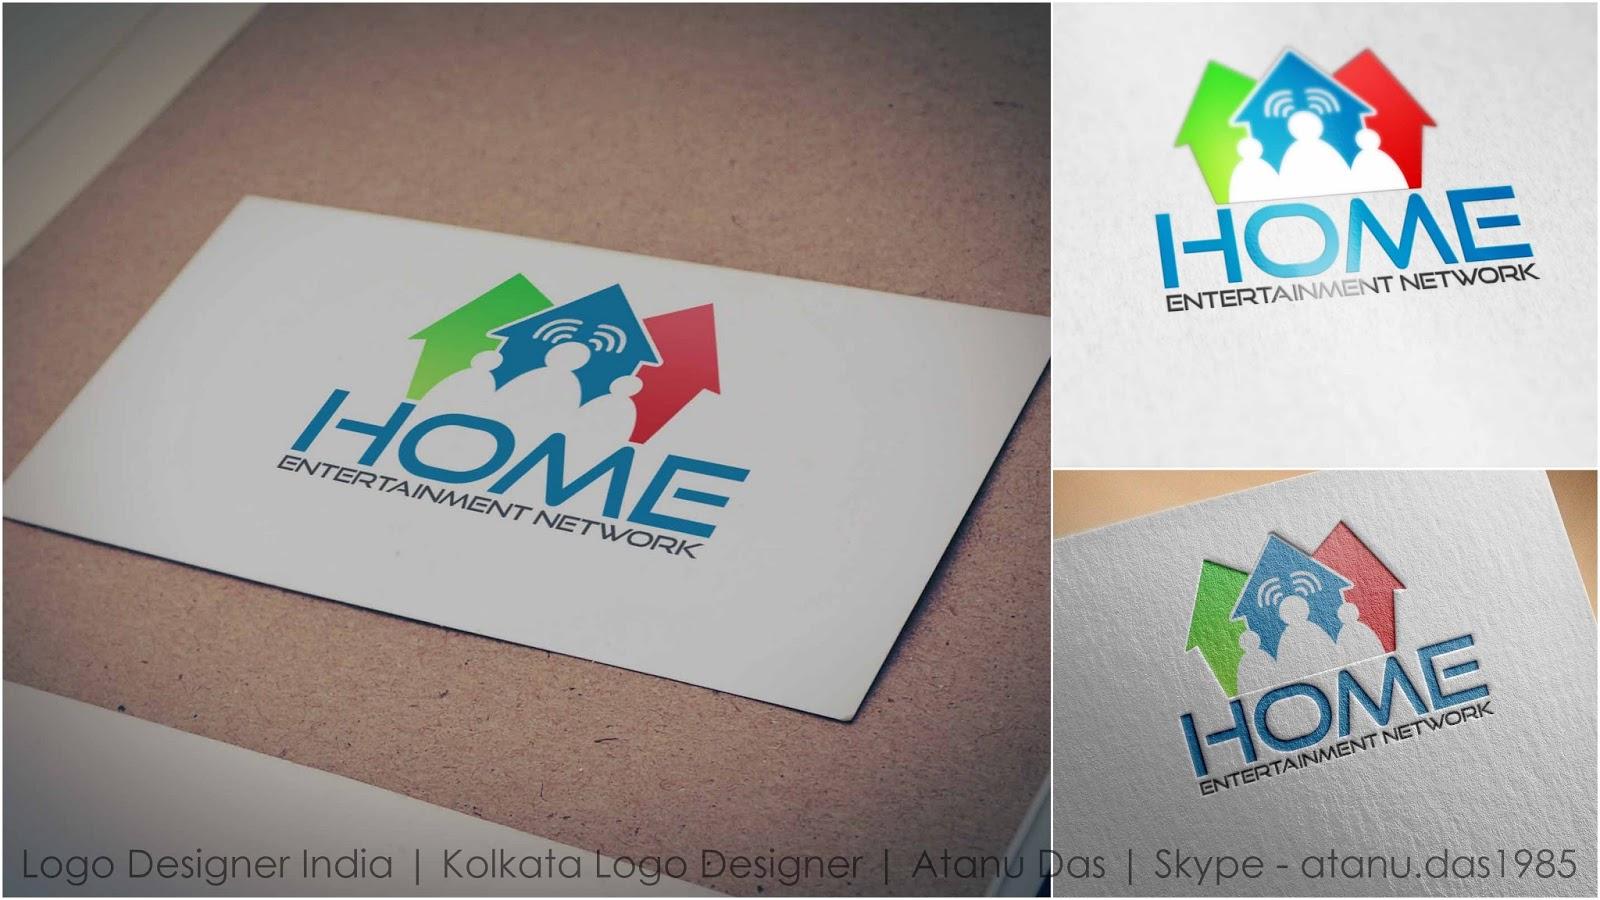 100 home network design 2015 teresa creation the design logo expert graphics design expert logo designer india